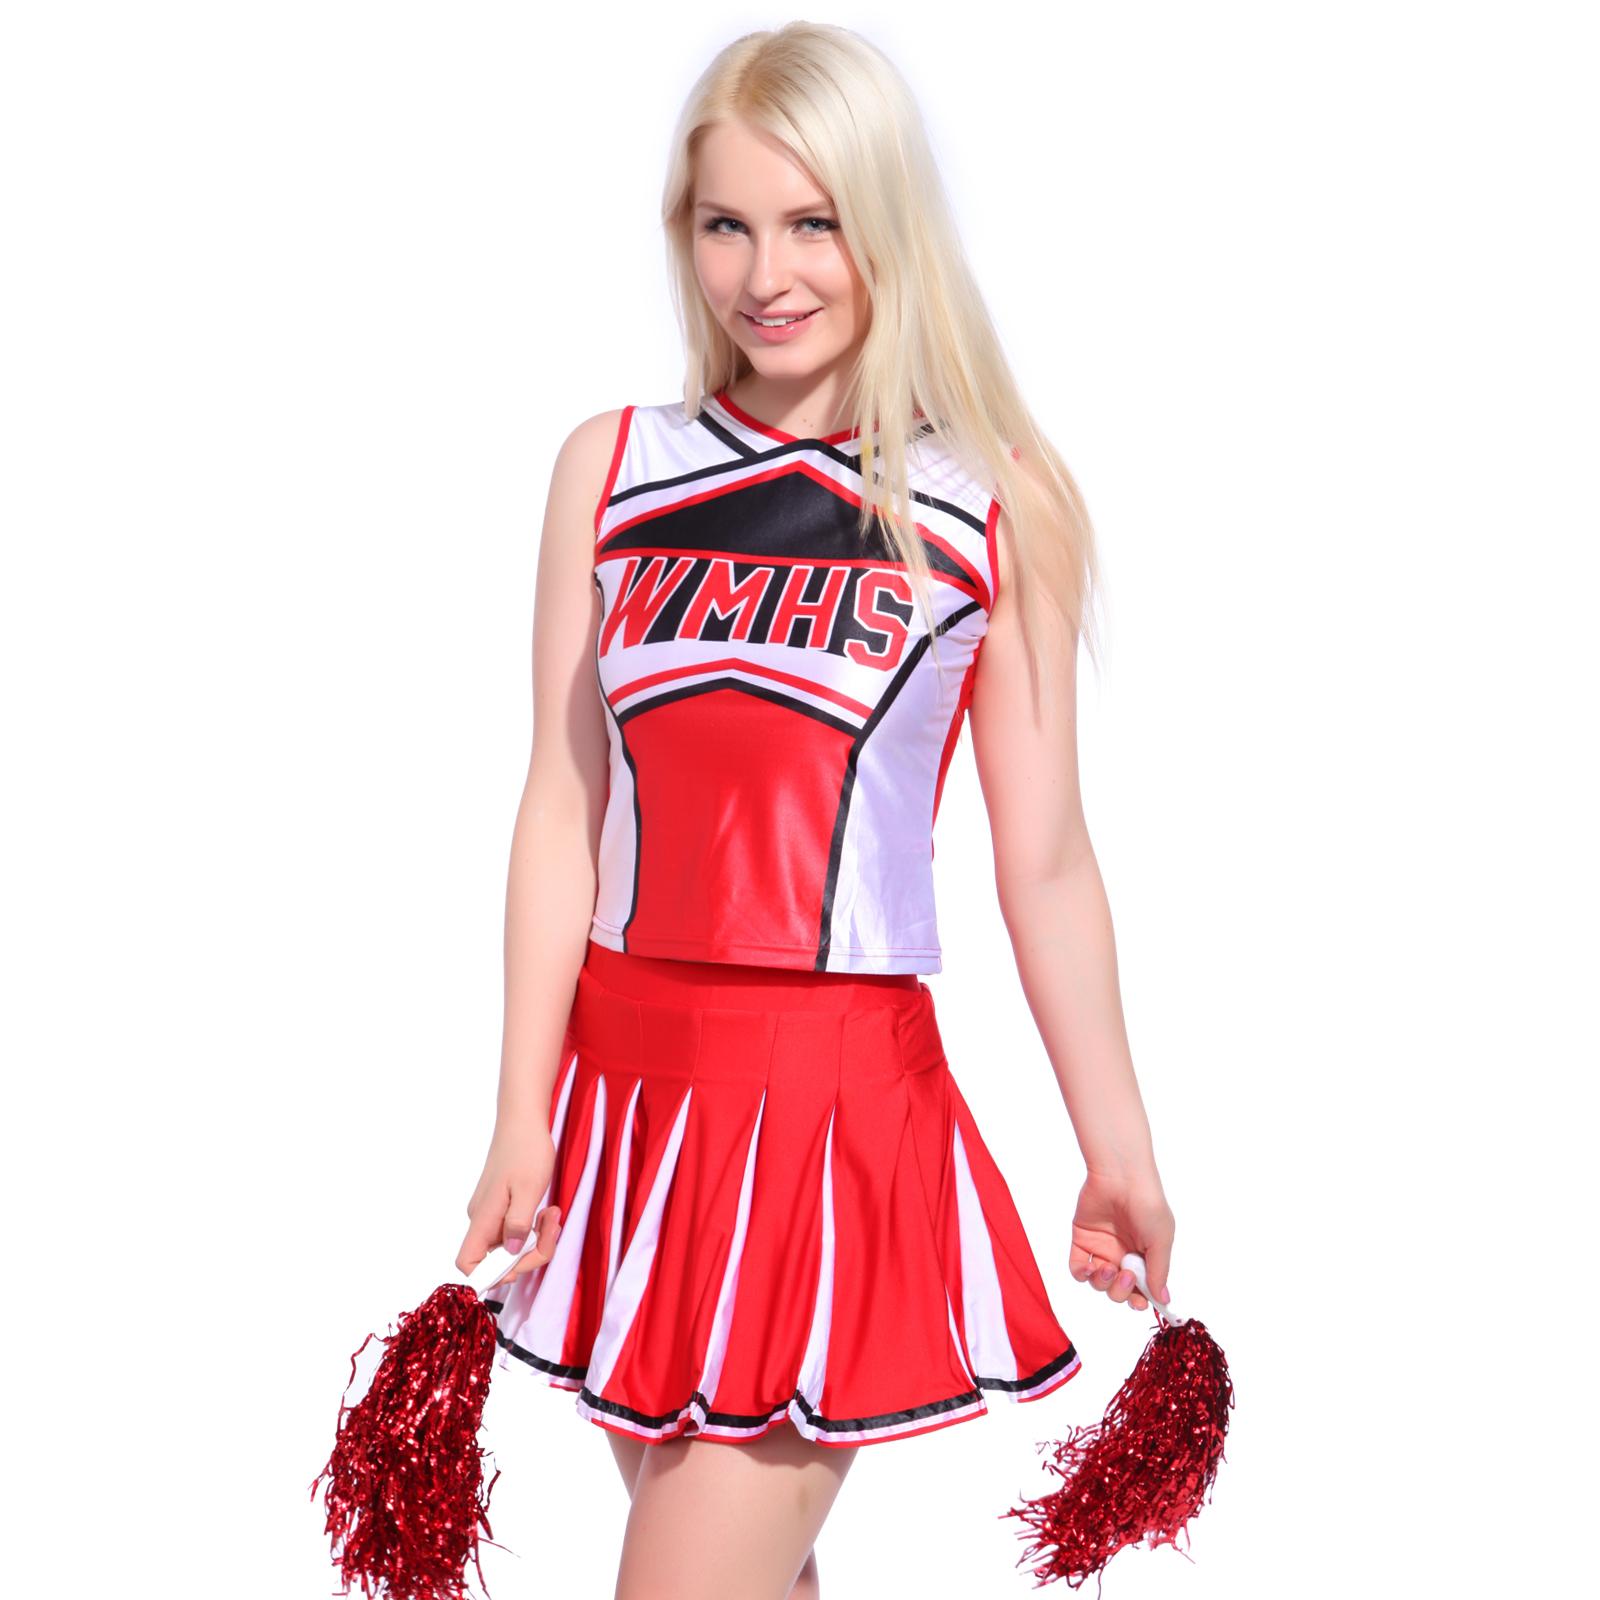 high school cheer musical glee cheerleader costumes outfit